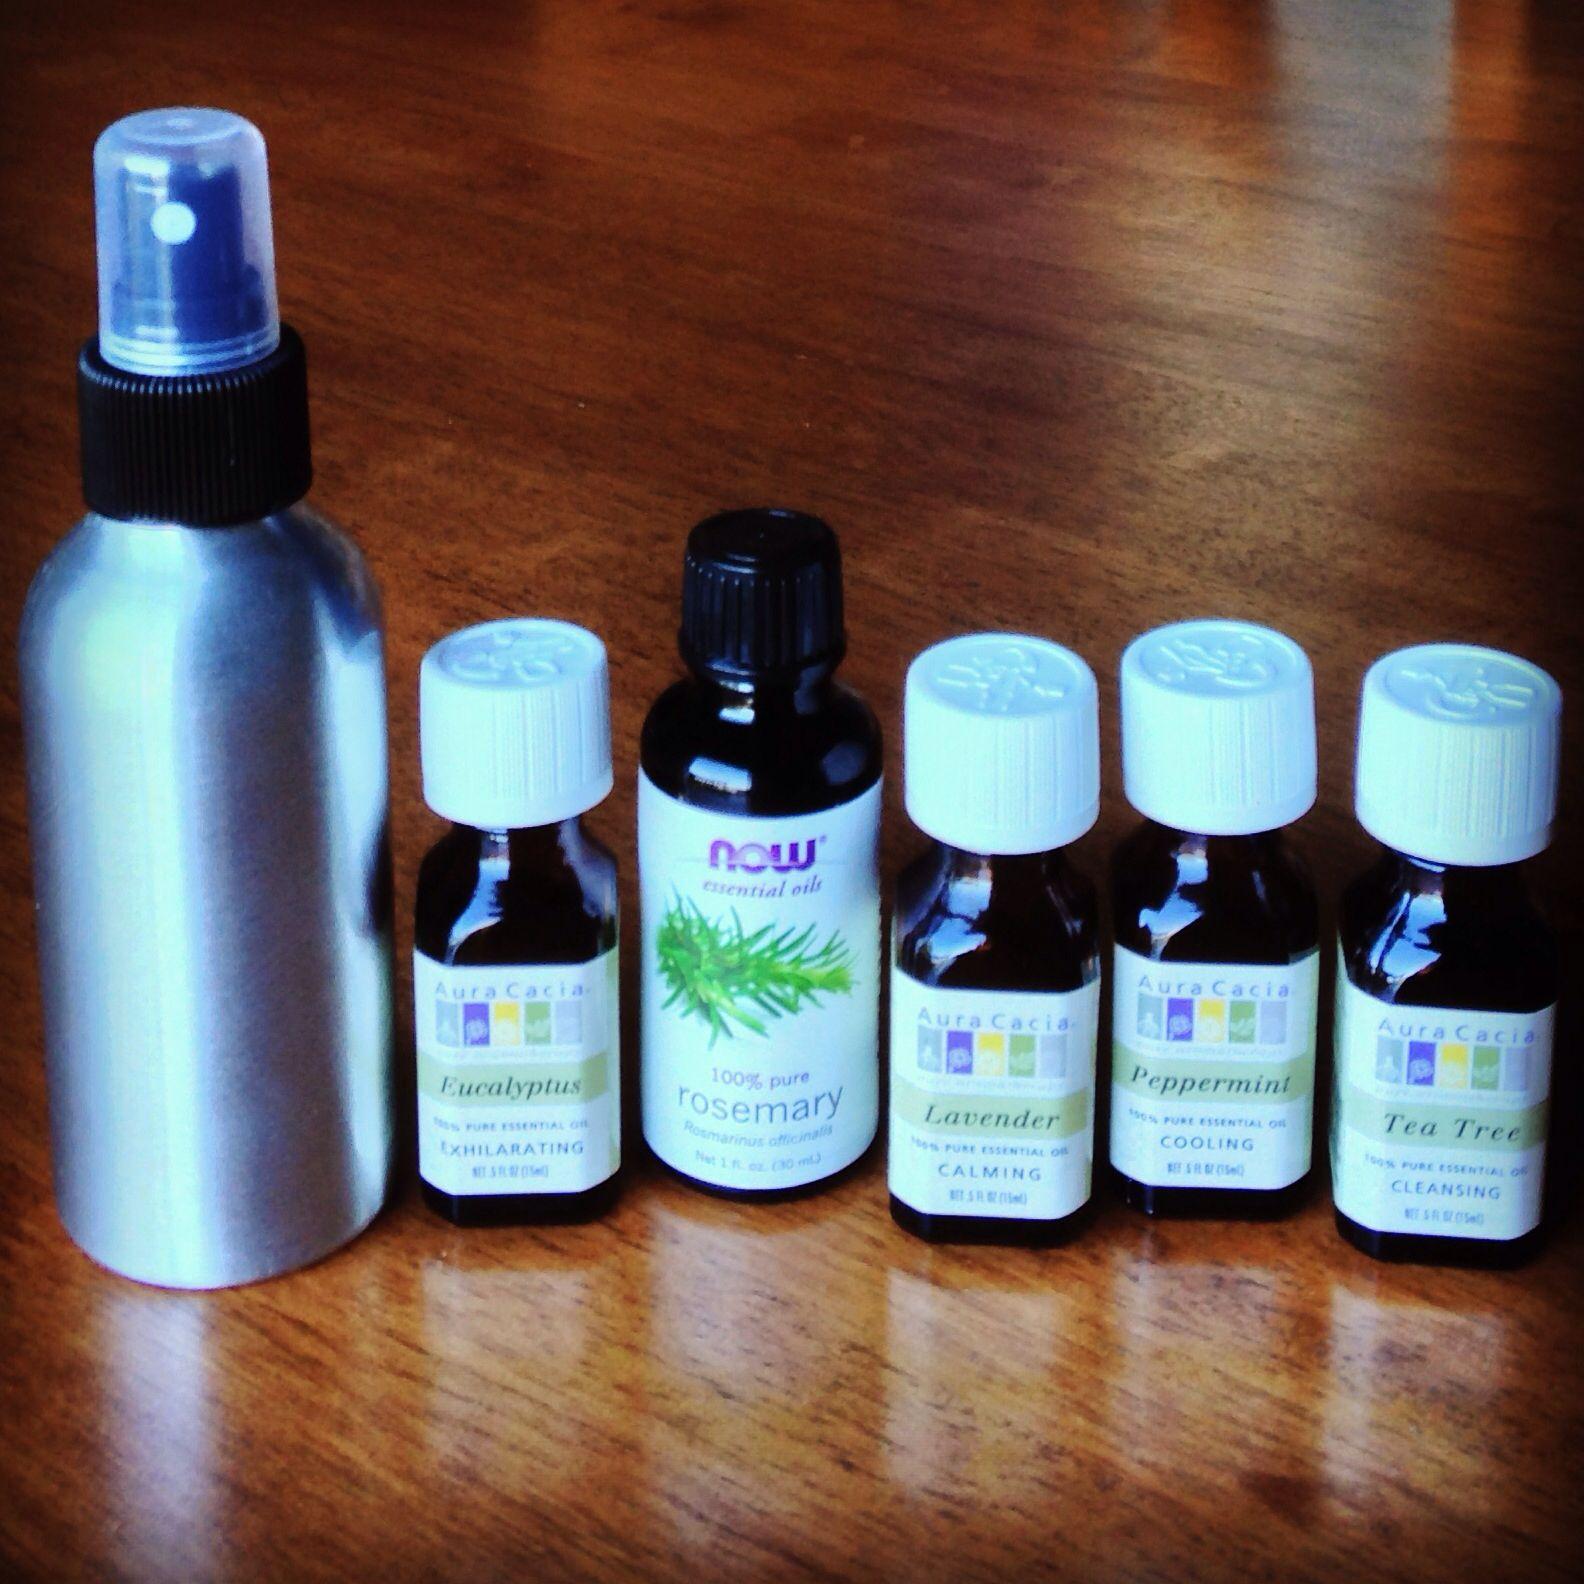 Lice prevention oil blend for treating kids drops of each oil